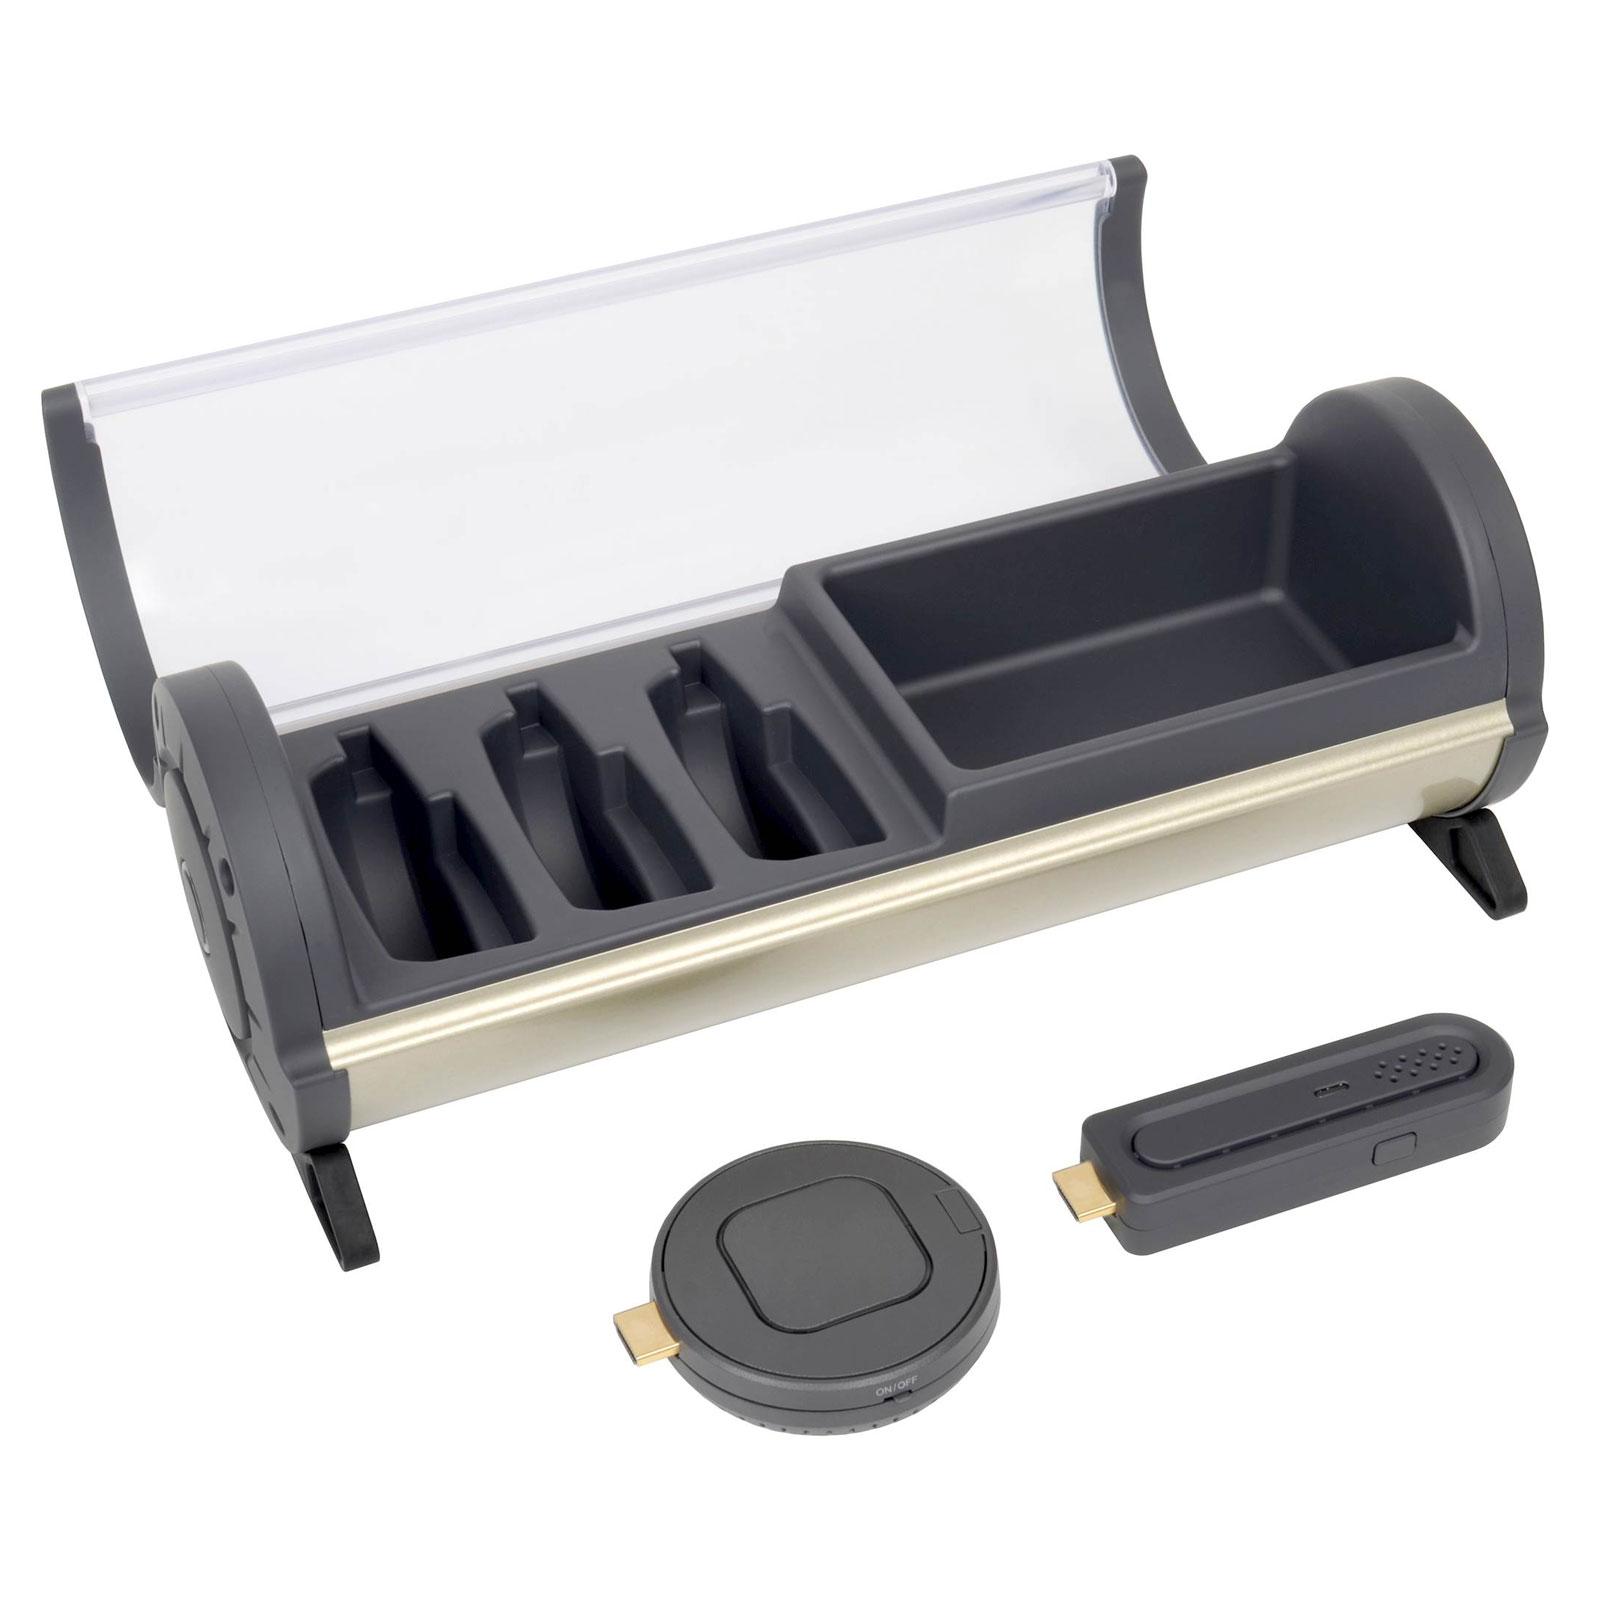 optoma quickcast bundle accessoires optoma sur. Black Bedroom Furniture Sets. Home Design Ideas